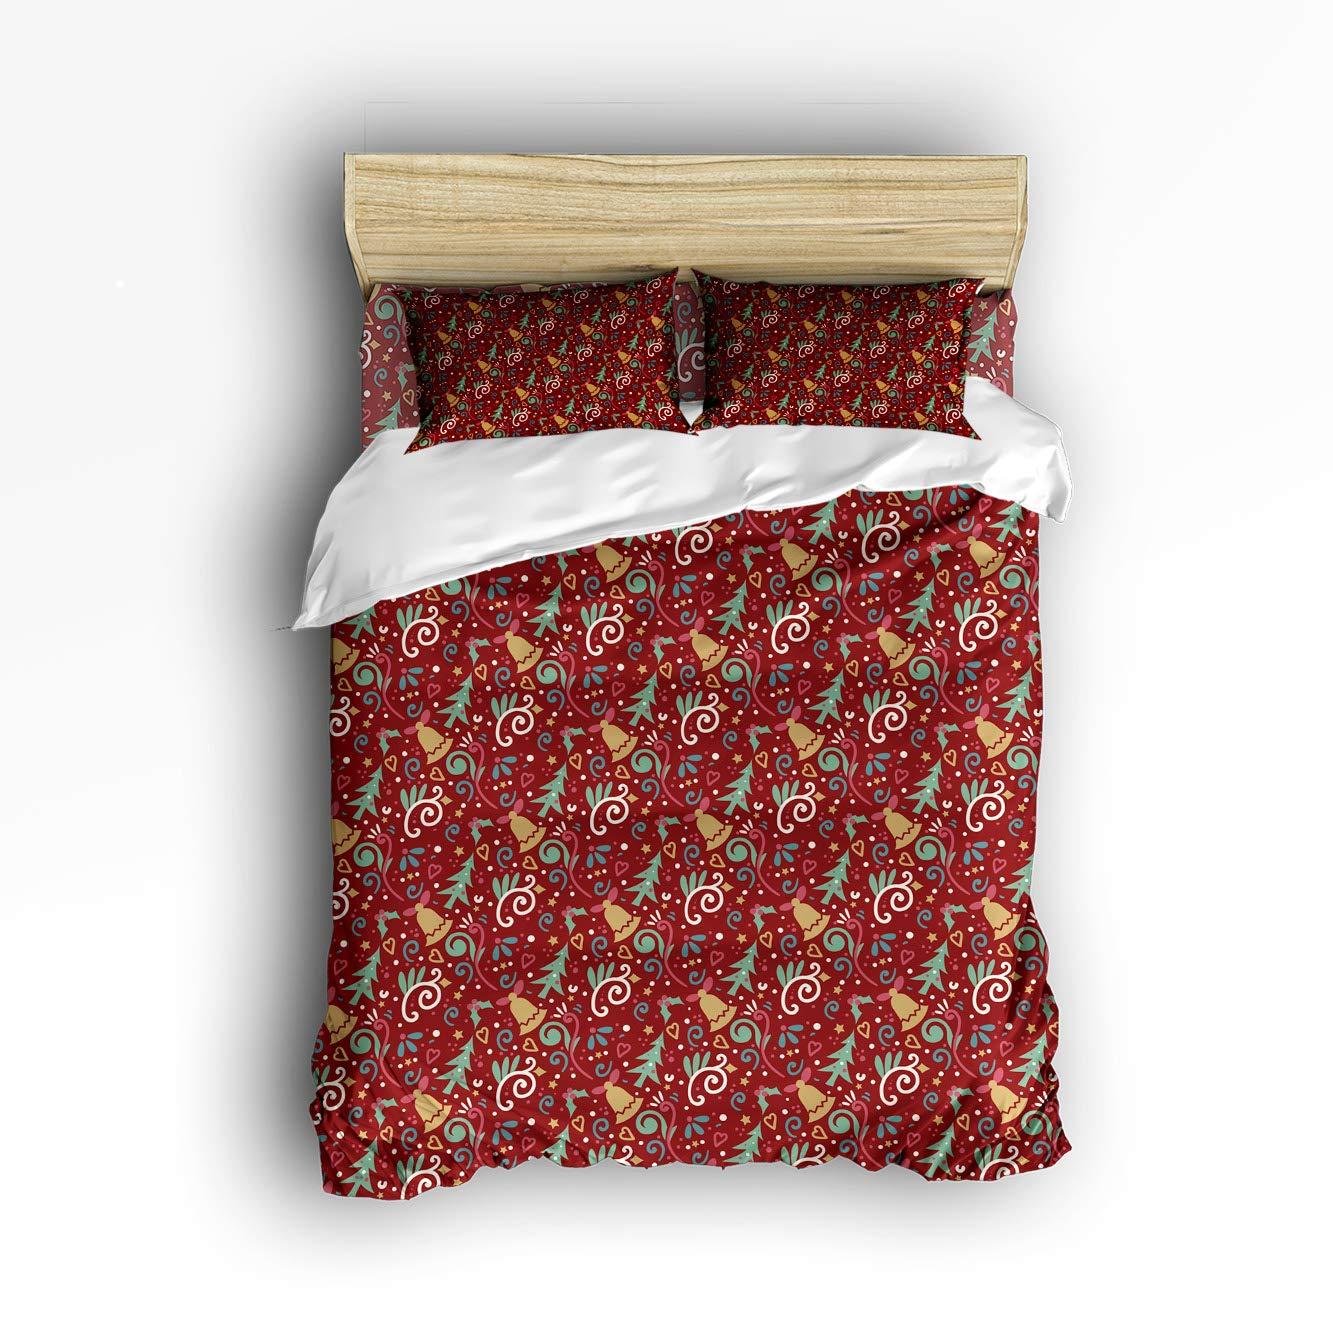 Anzona 寝具4点セット クリスマスエレメント 陽気なセレブレーション 木の葉とベルの装飾 4ピース羽毛布団カバーセット ベッドスプレッド 子供/子供/ティーン/大人用 Queen Size 20181009zly4pcsbed-SLXM01647SJTCAZN B07JW45QT7 Christmas725l Queen Size